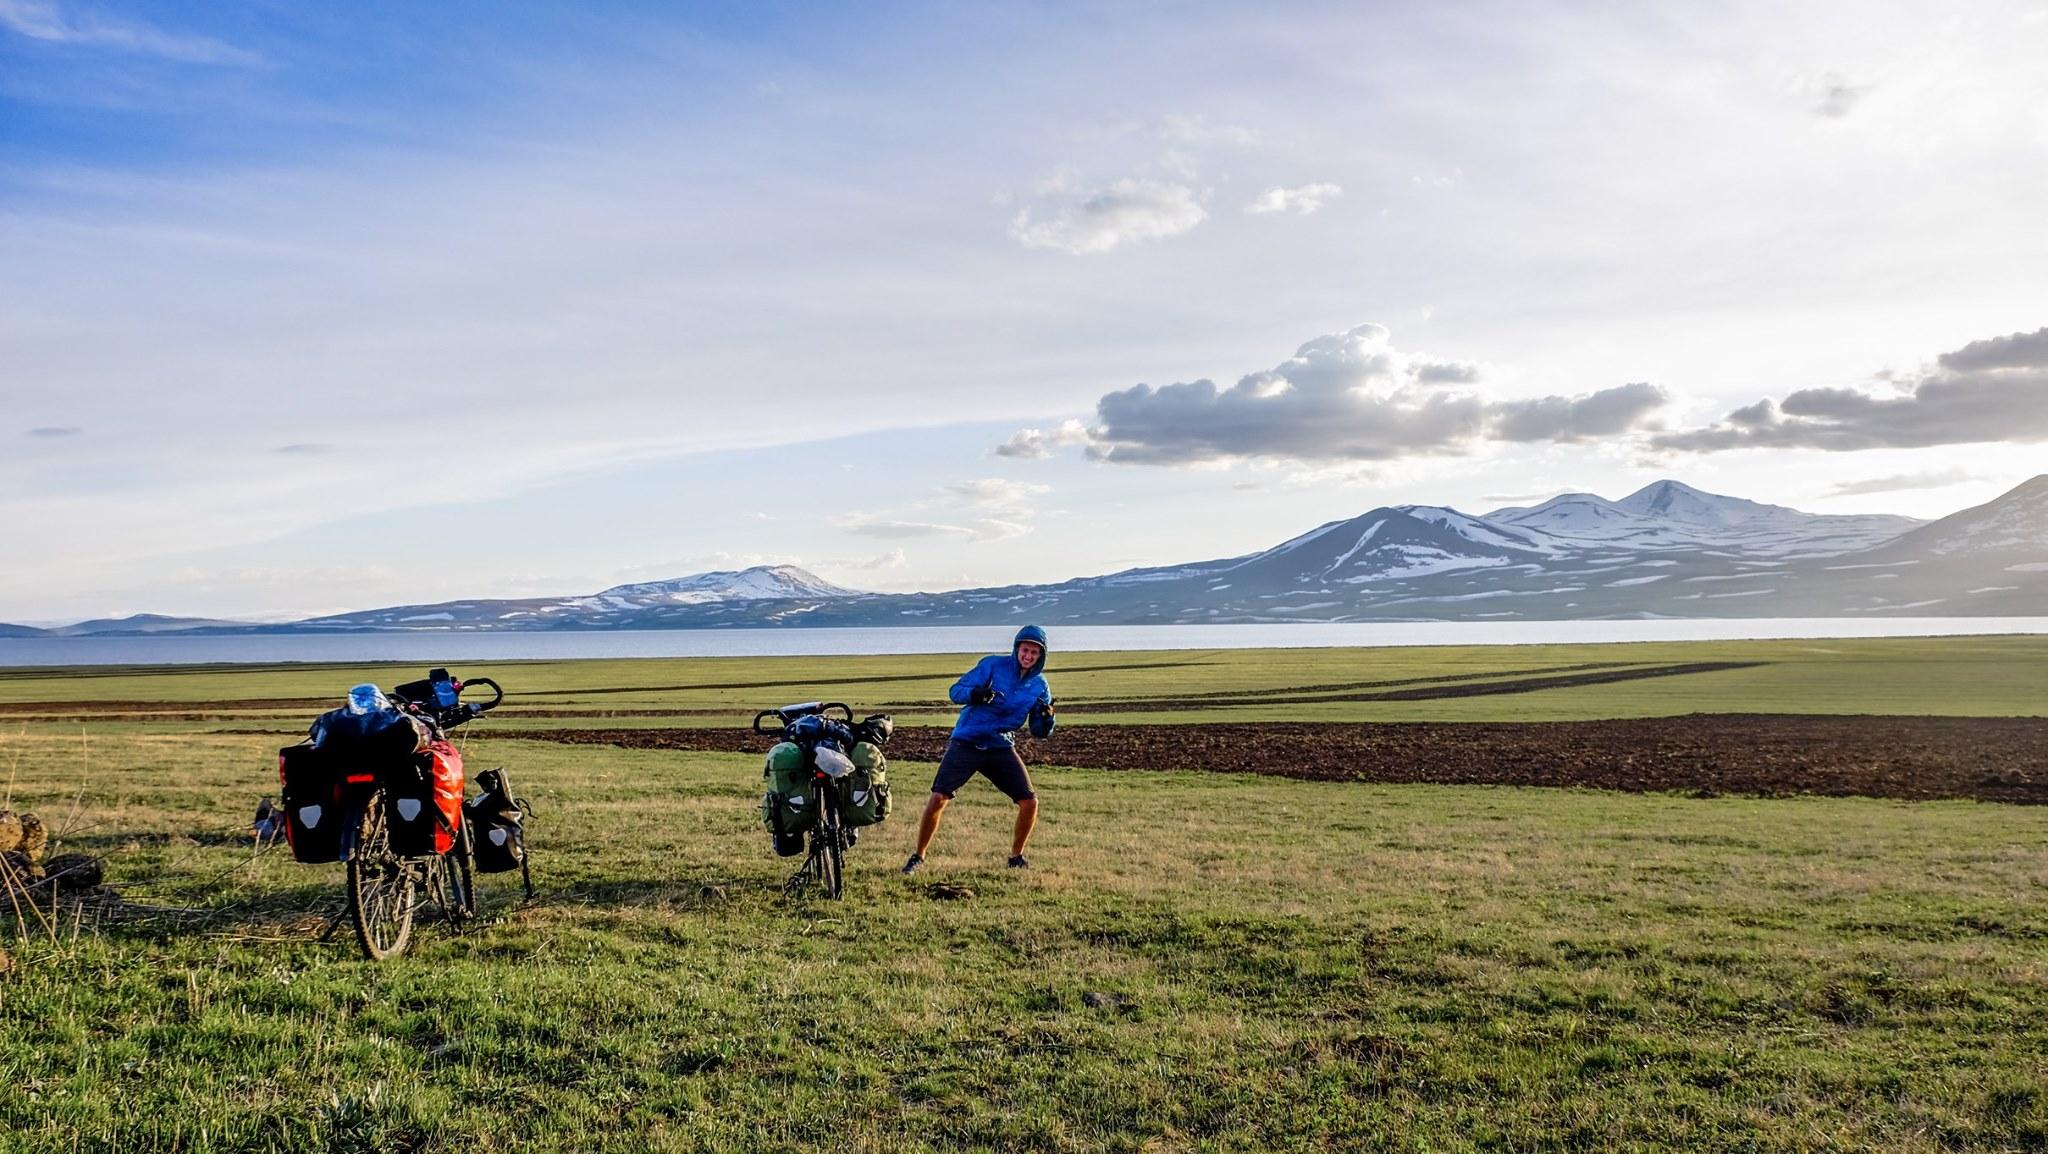 Biking Across The World